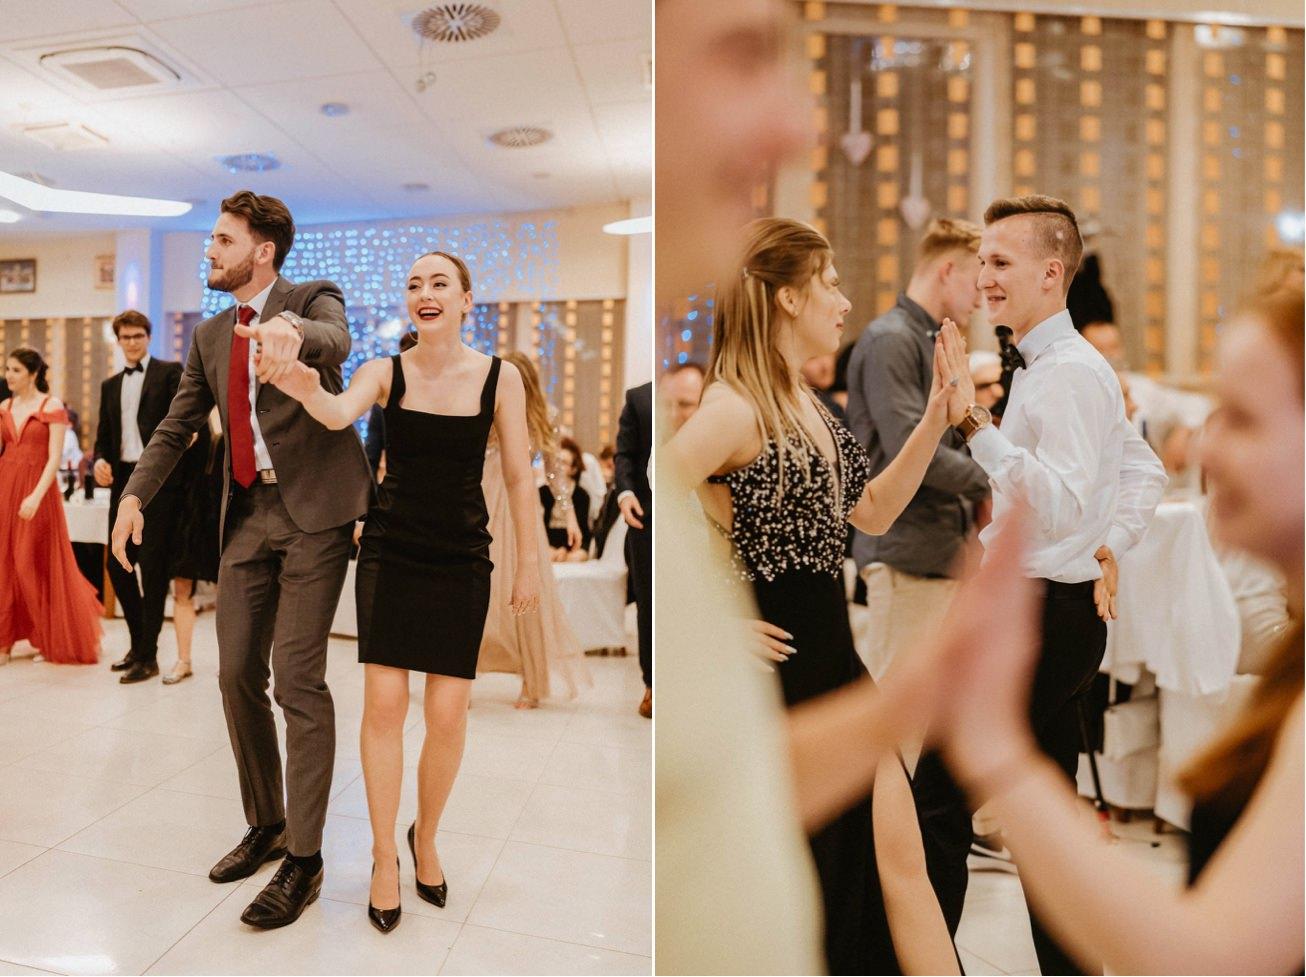 Hotel Dolenjc Maturantski ples fotograf 119